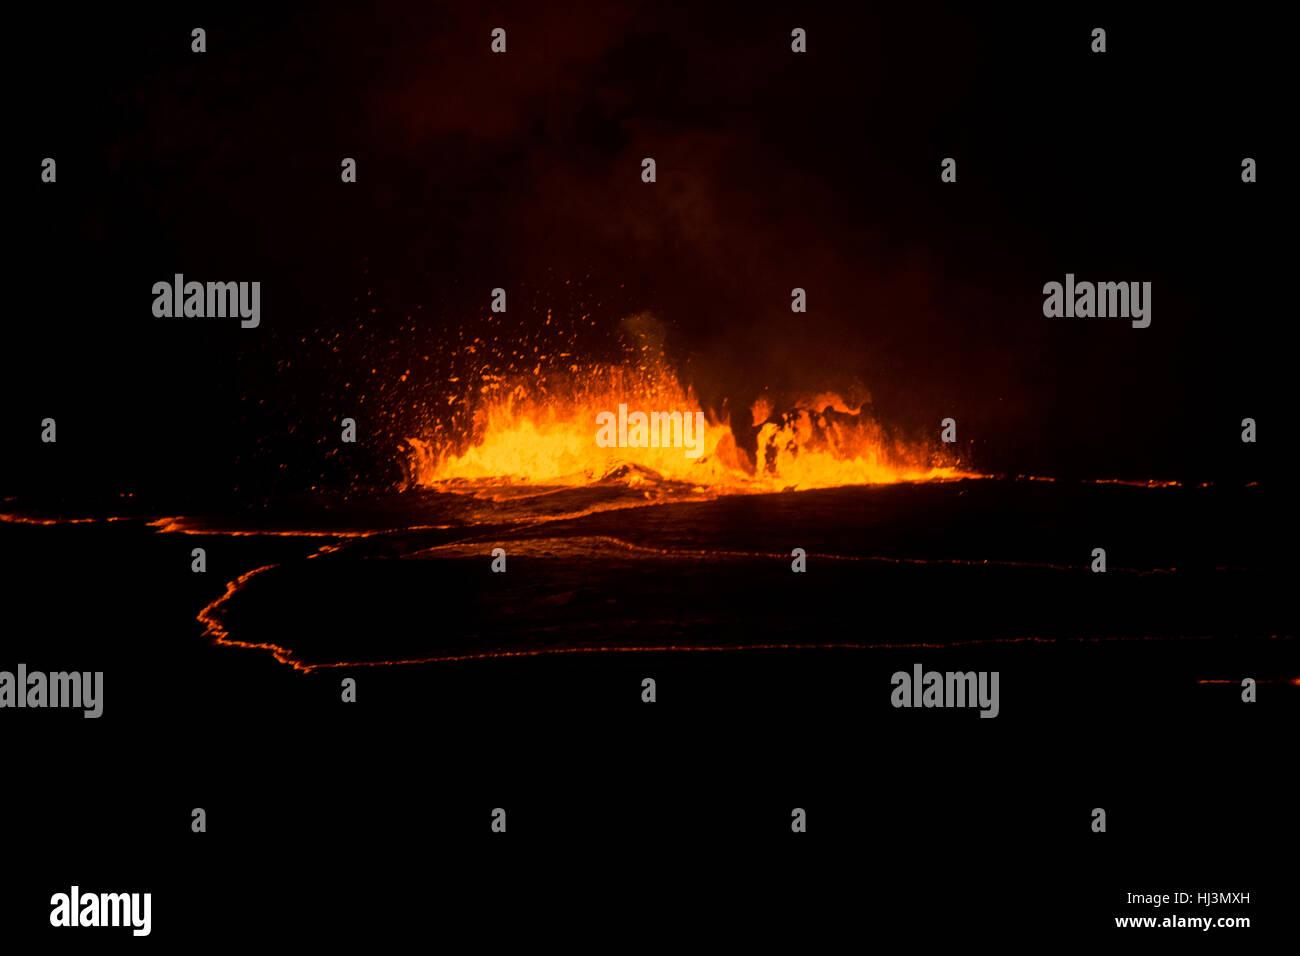 Active lava exploding inside the Halemaumau Crater at night, Kilauea Volcano, Volcanoes National Park, Hawaii, USA - Stock Image